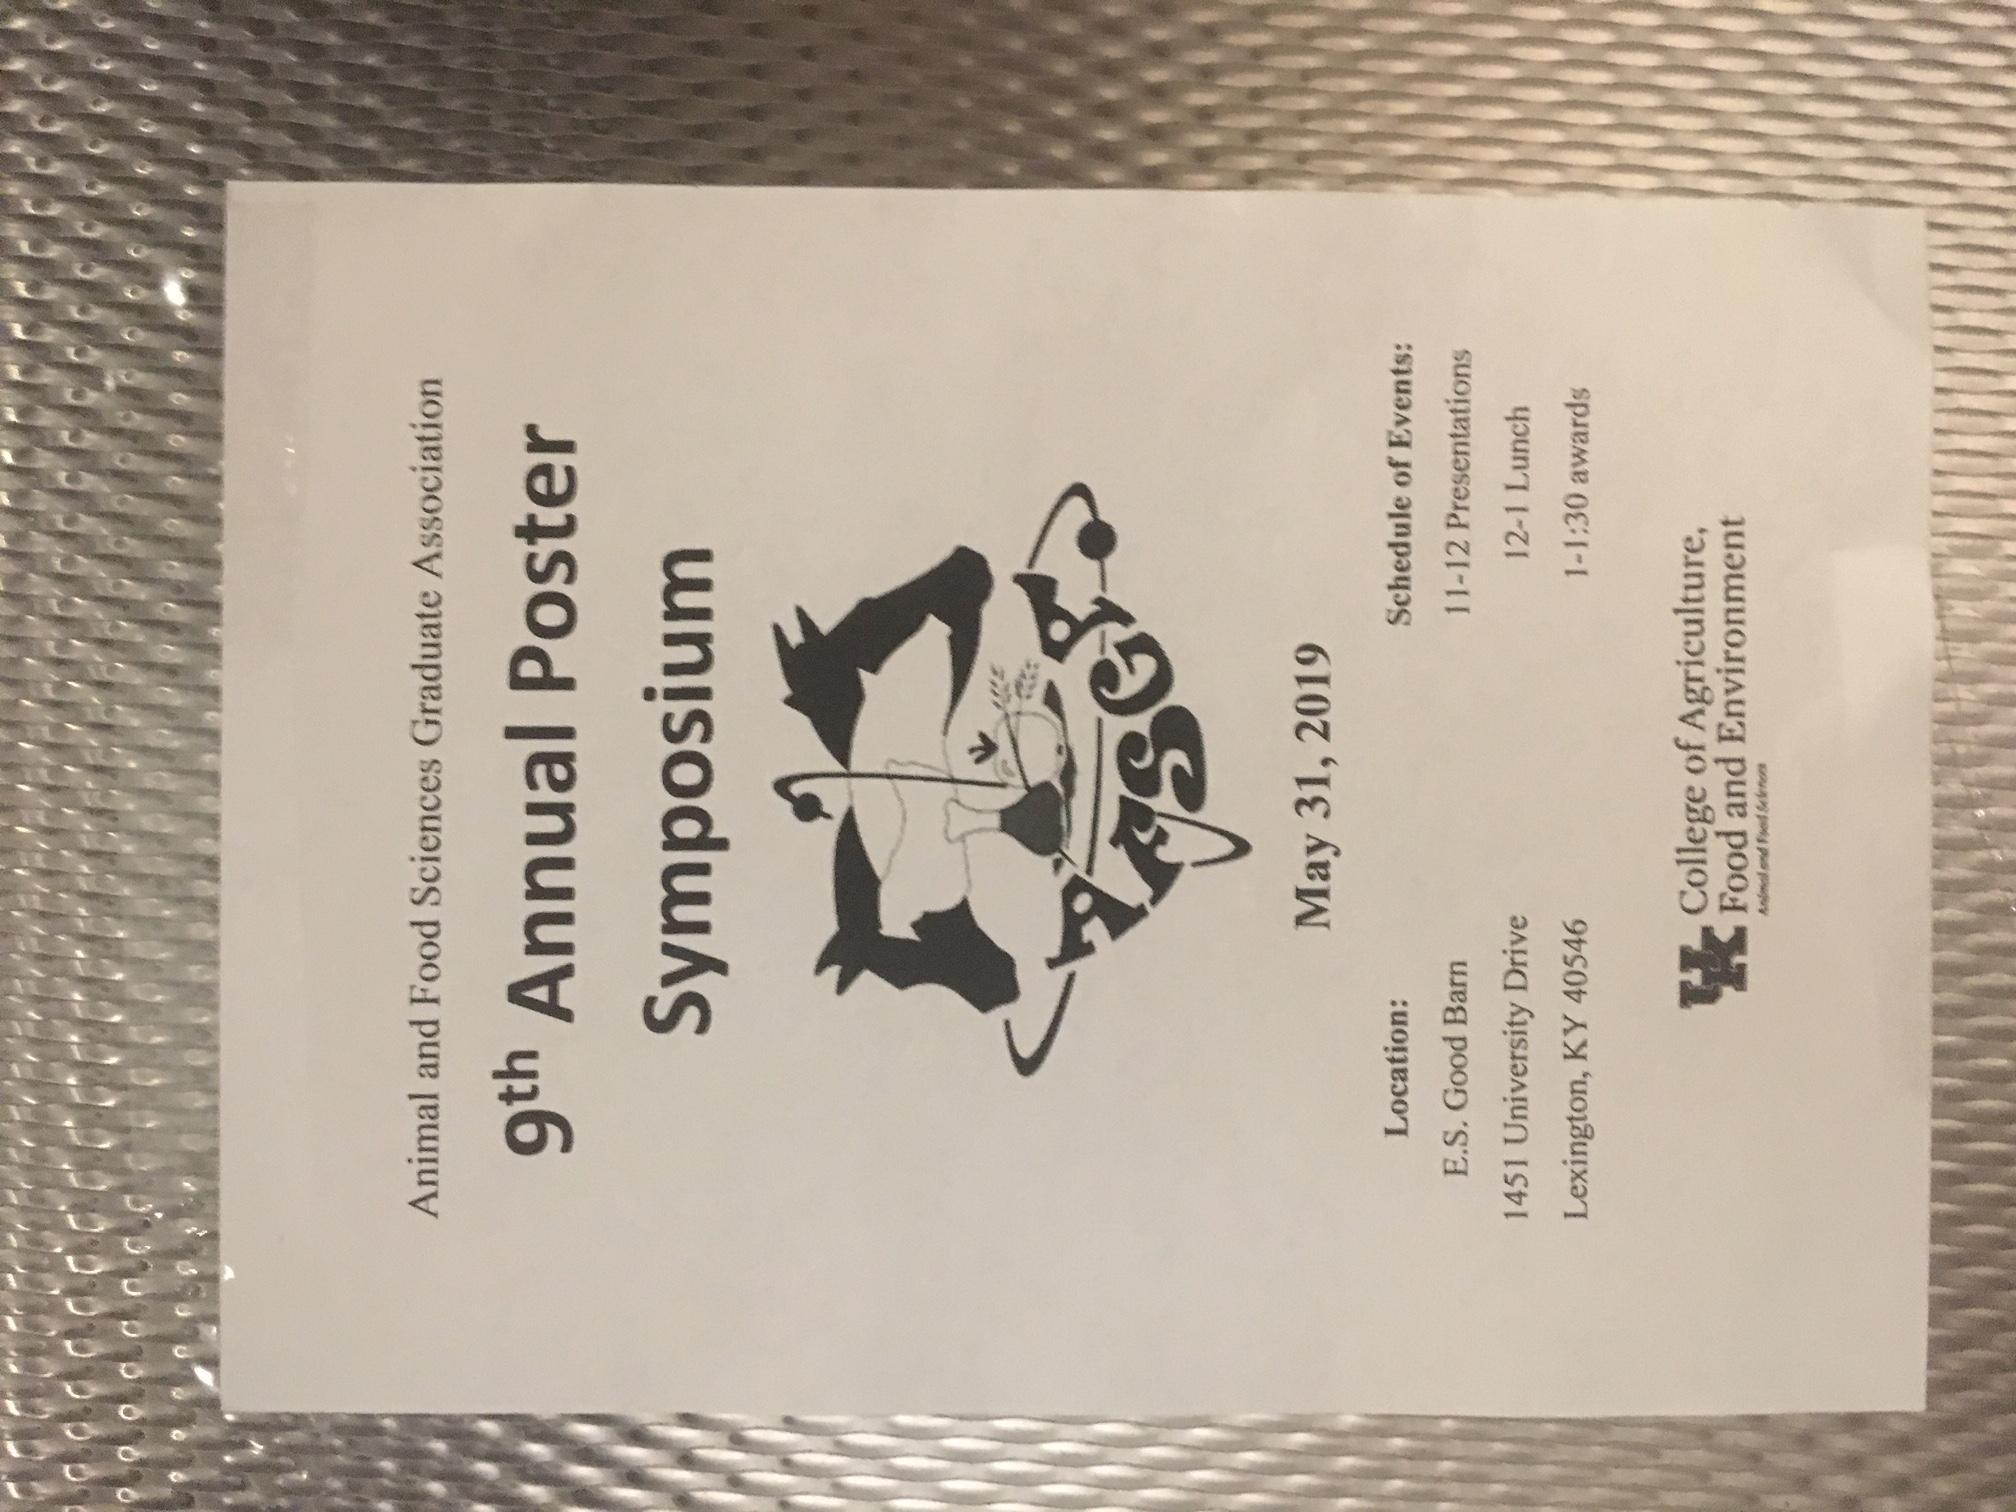 May 31 Poster Symposium